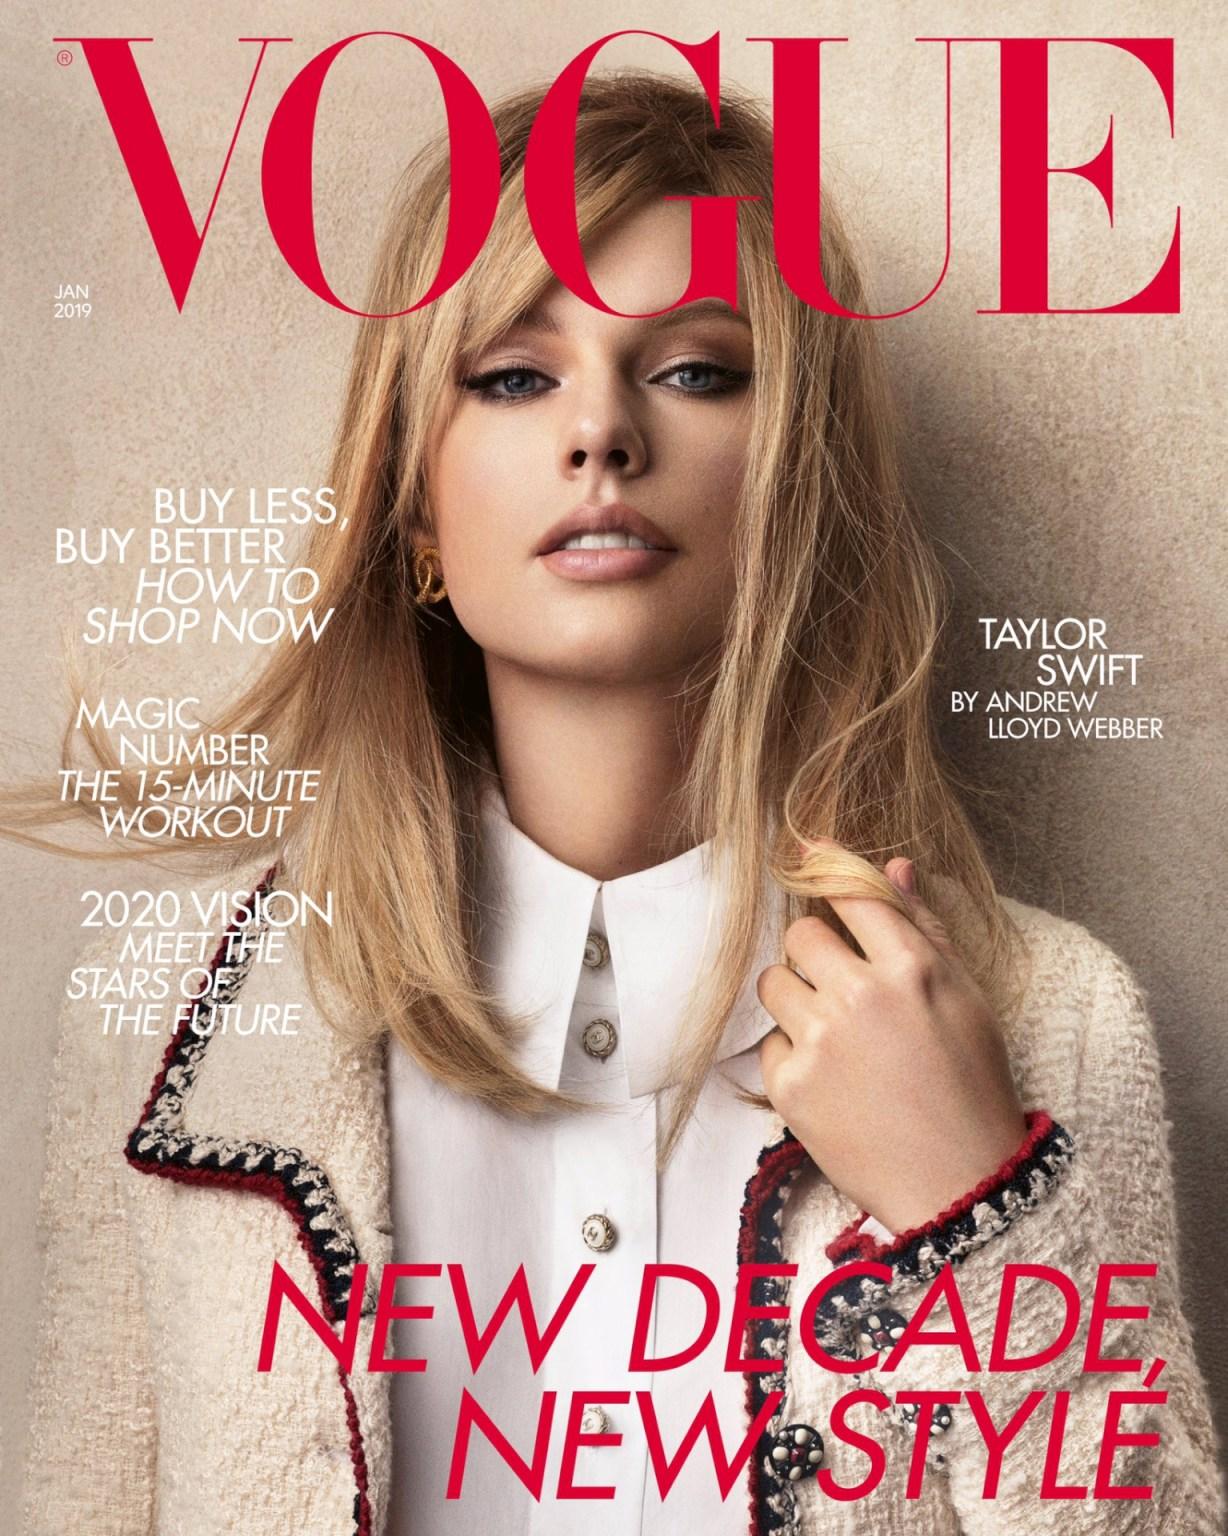 Taylor Swift Vogue magazine 2020